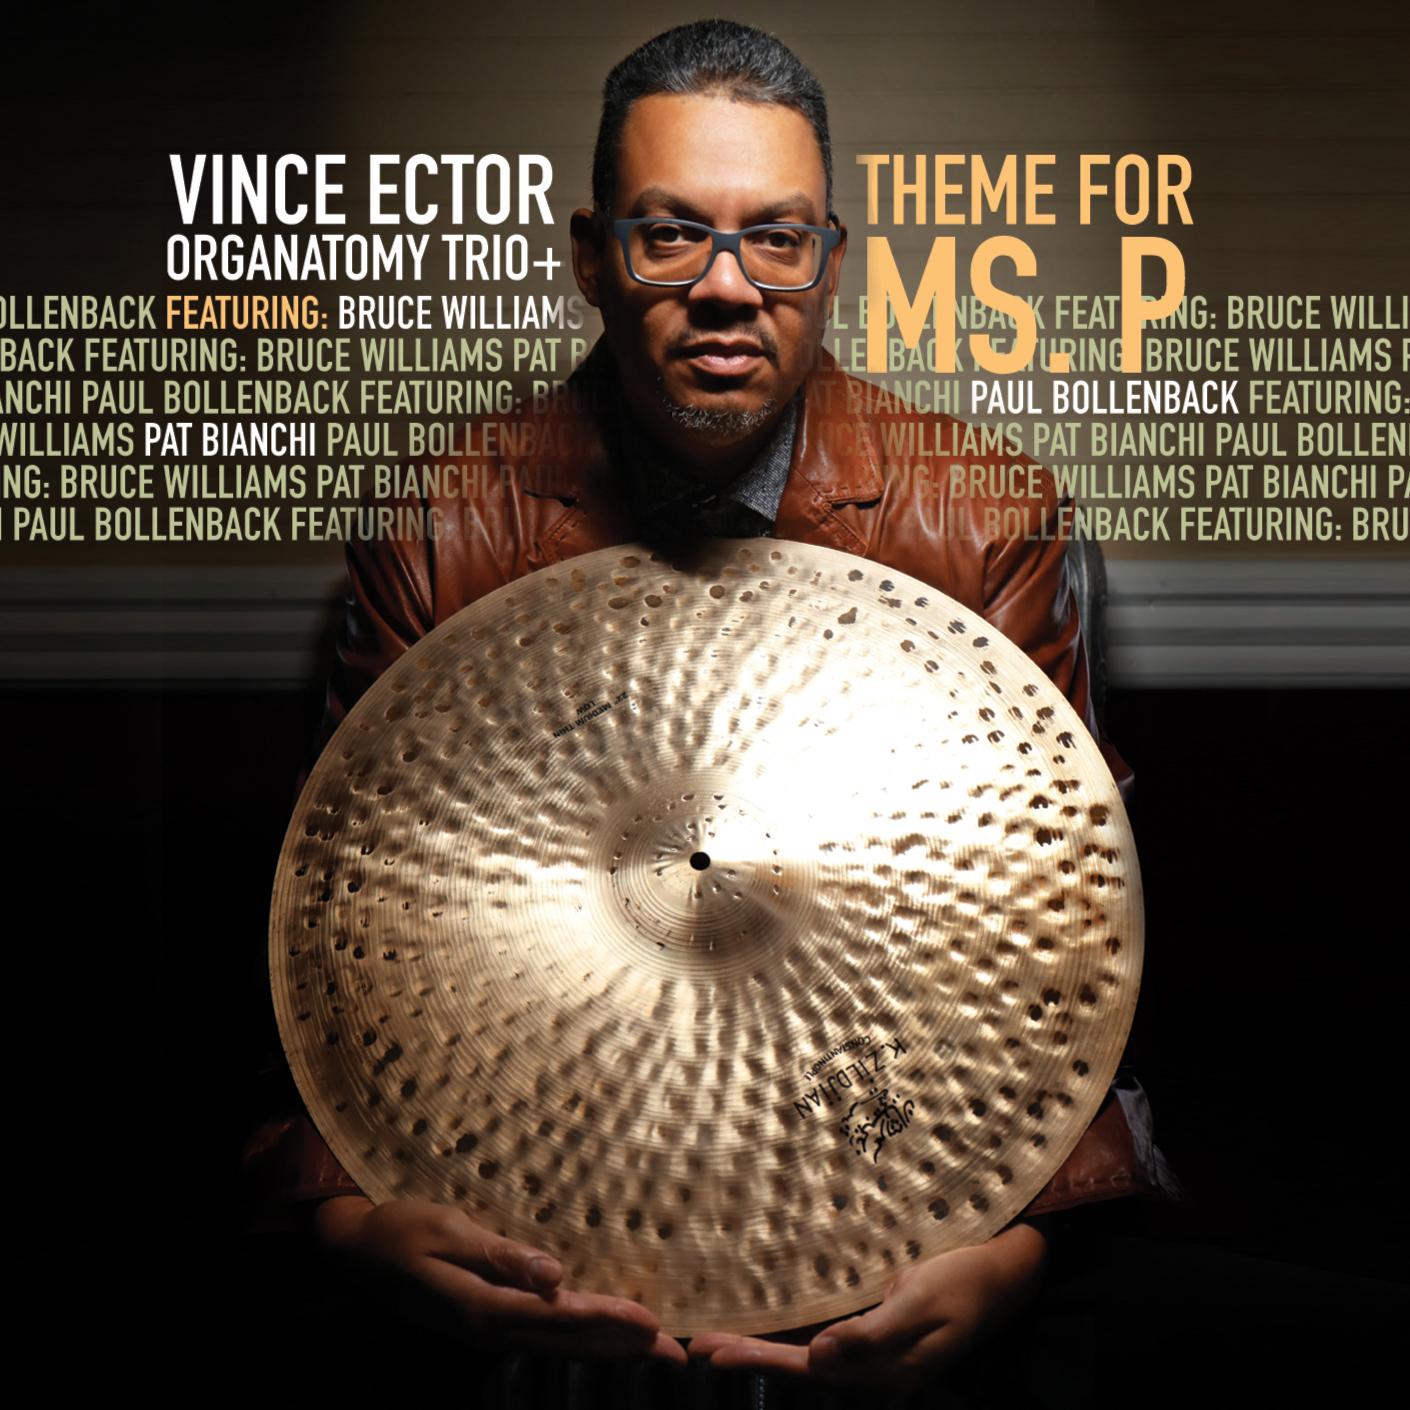 Vince Ector Organatomy Trio + CD Release Event